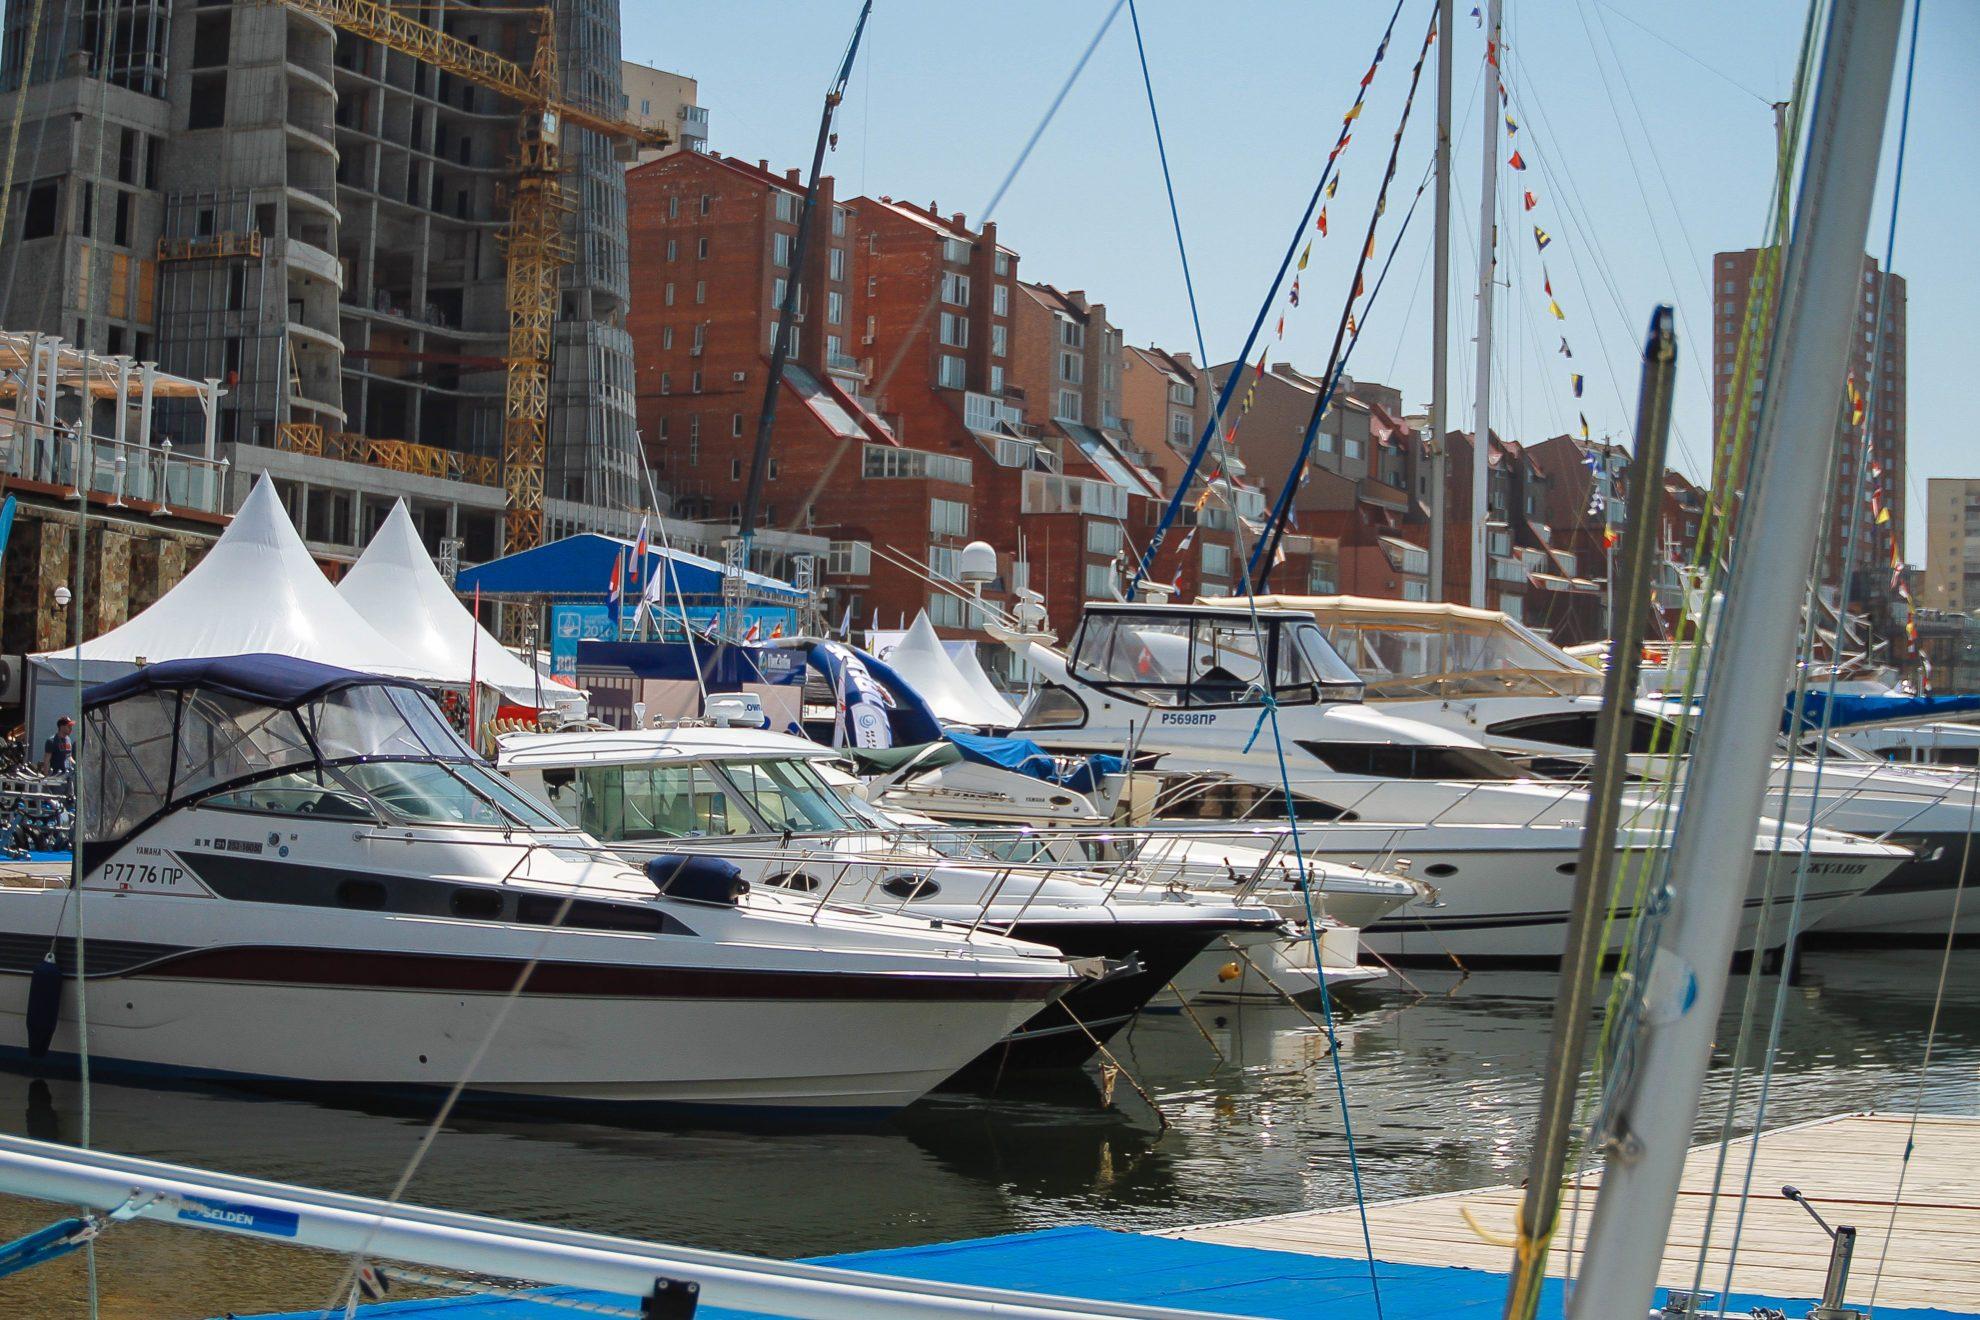 Vladivostok Boat Show ворвется в Тихоокеанский туристский форум